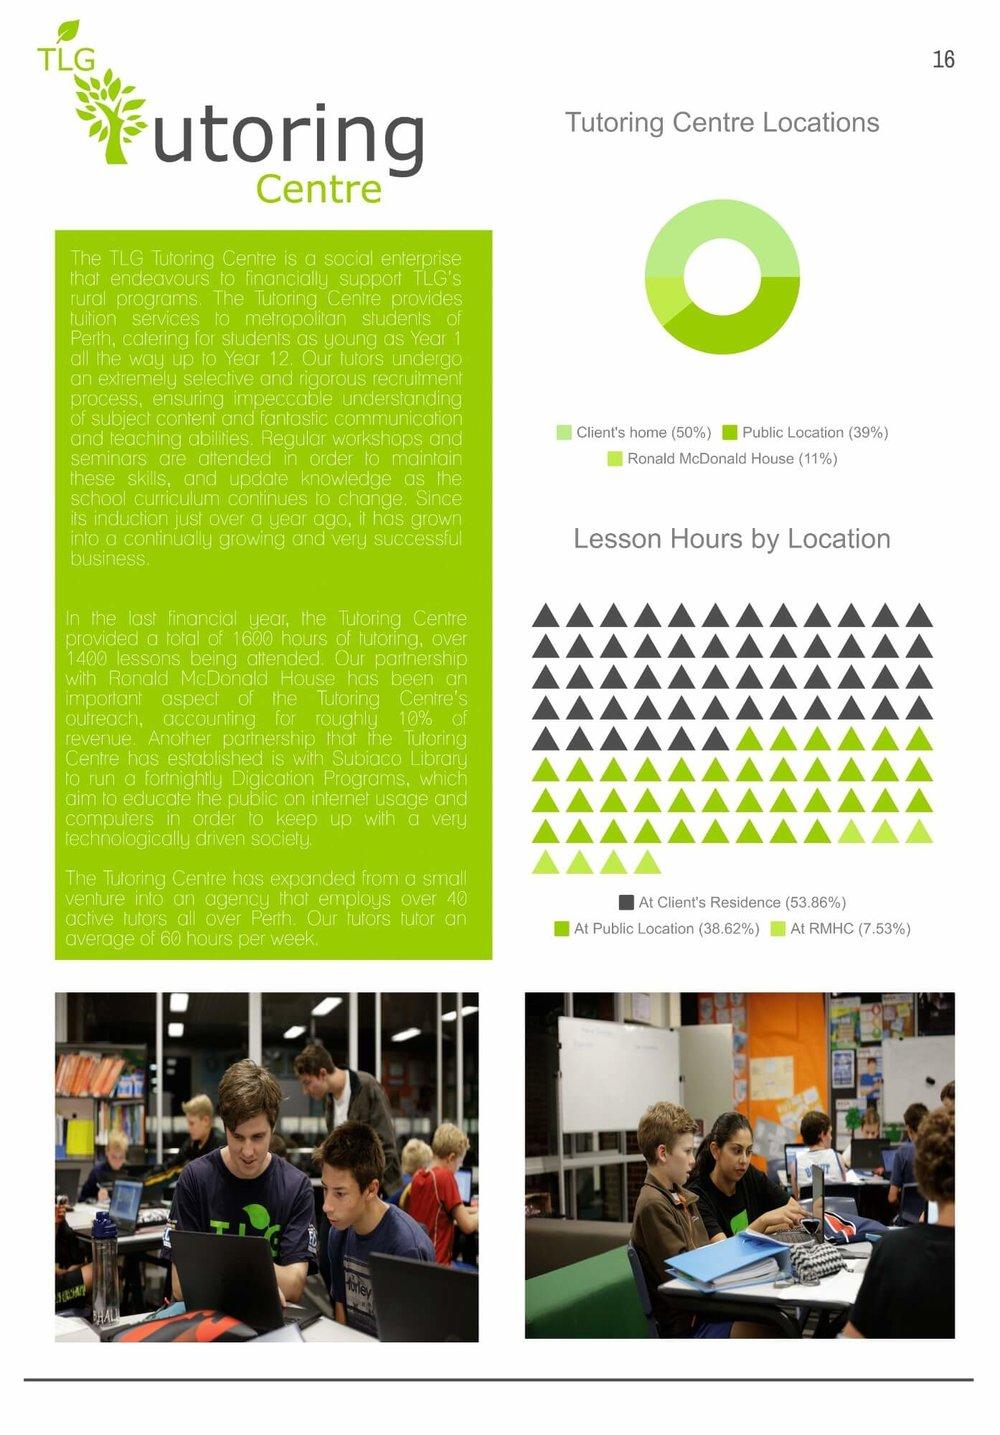 tlg-annual-report-FY16-16.jpg